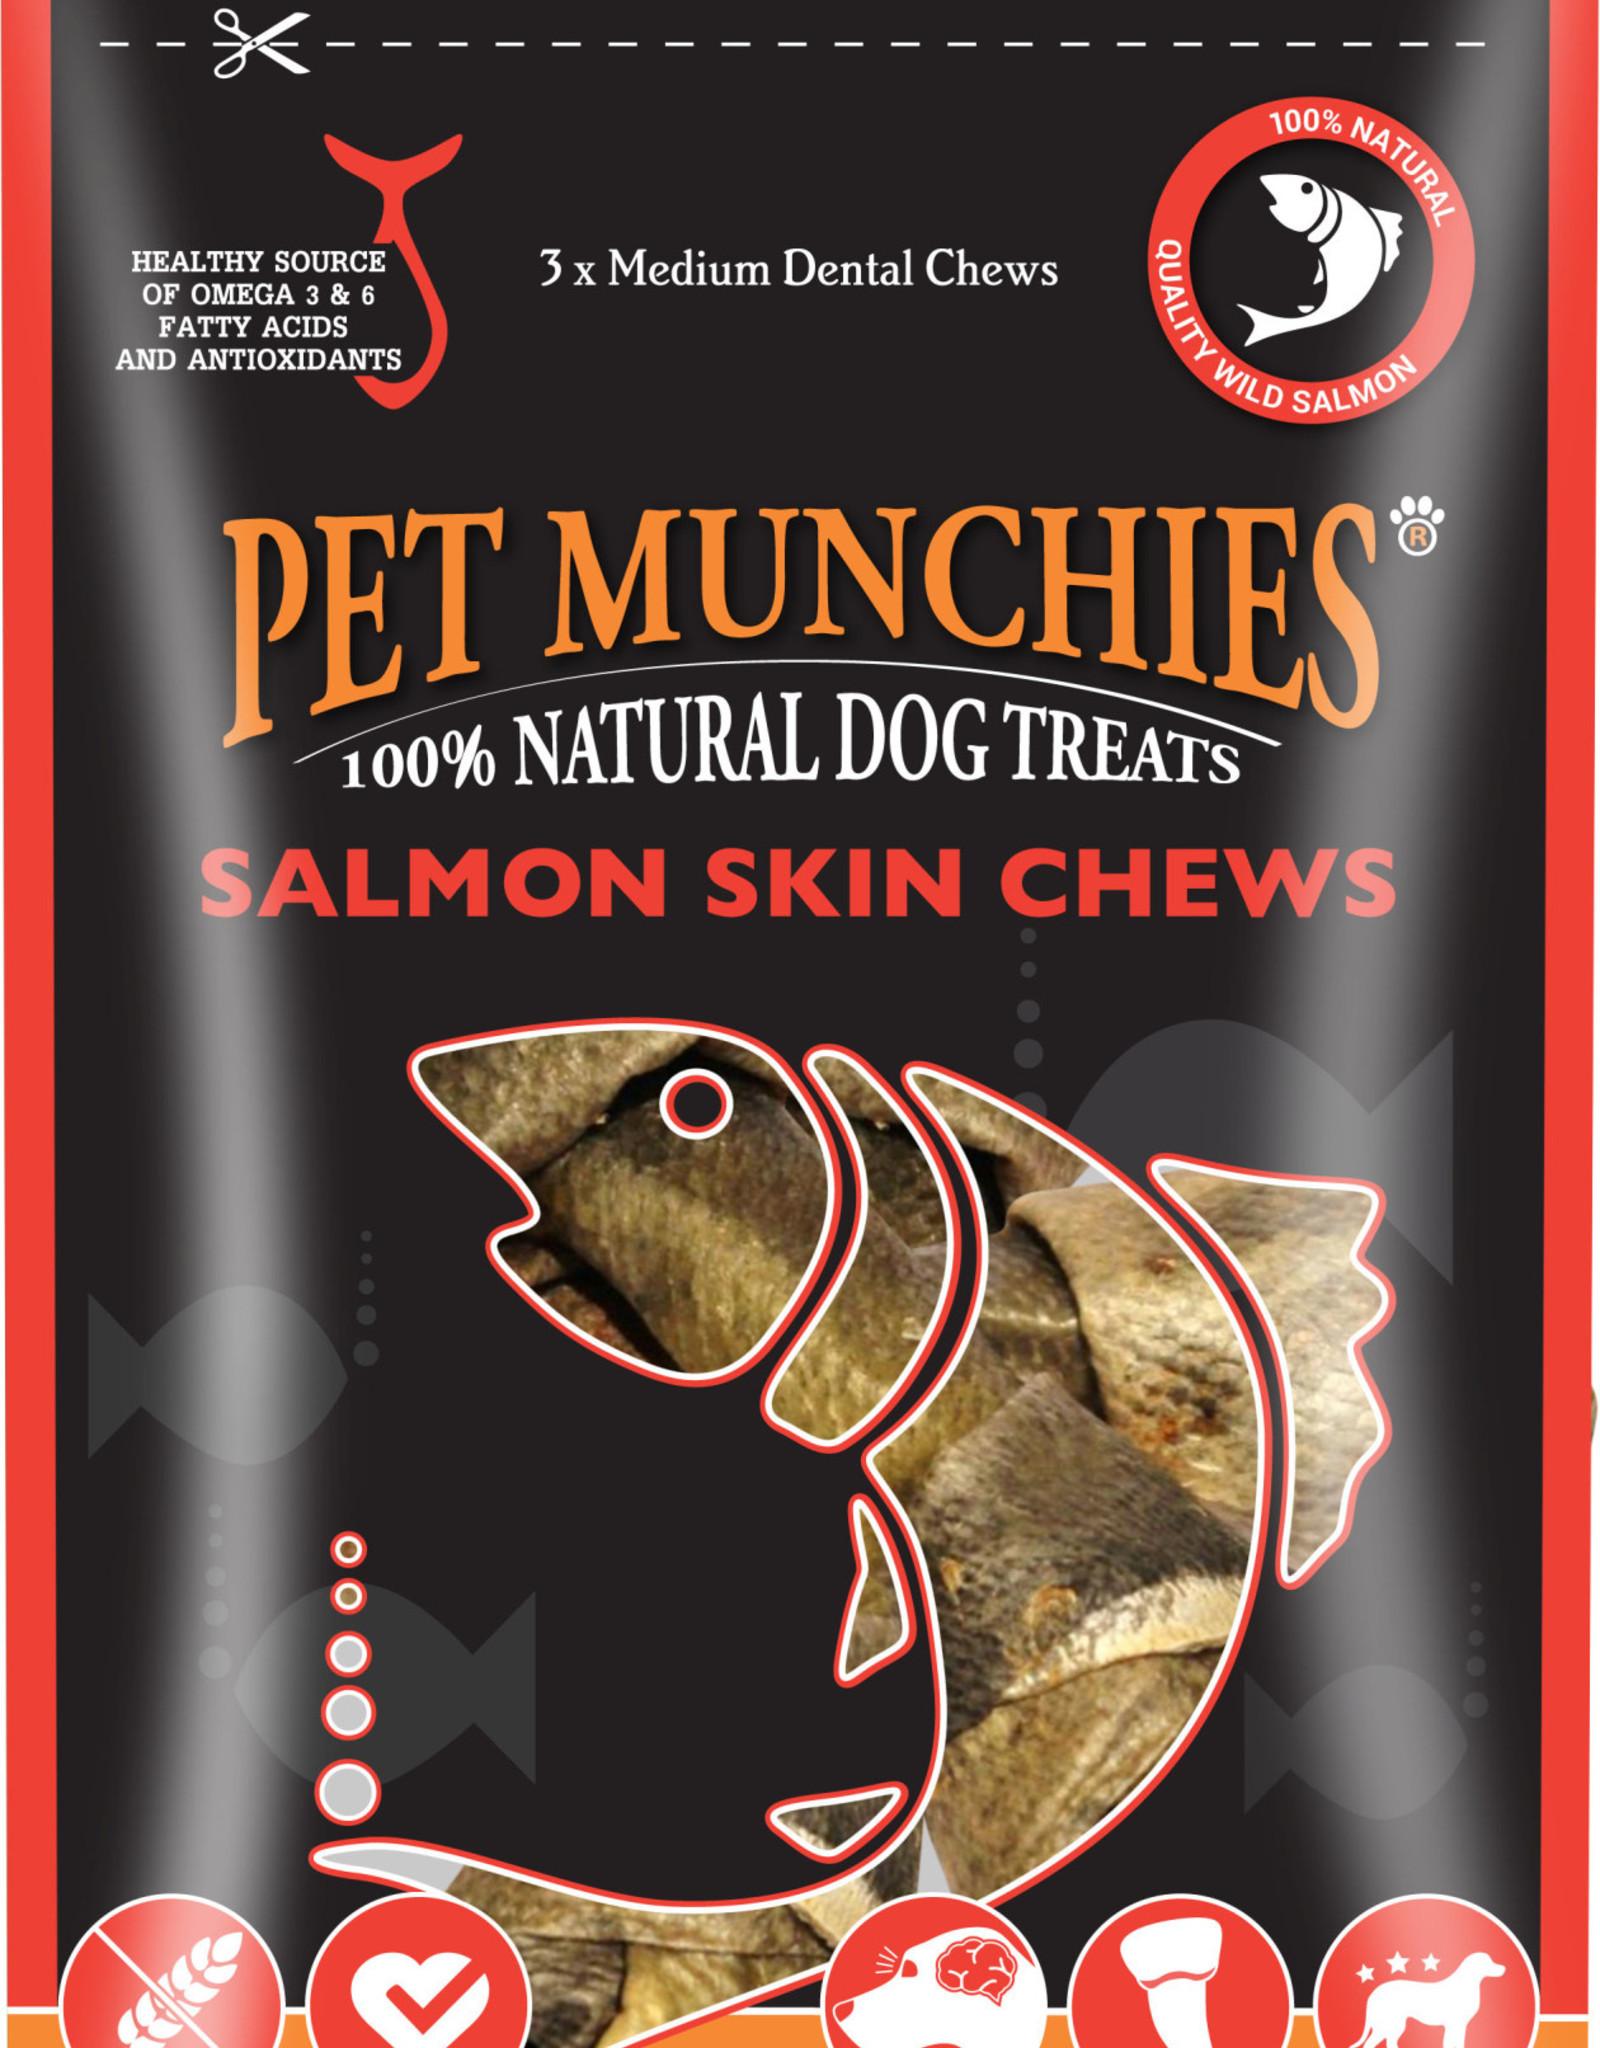 Pet Munchies 100% Natural Dog Treats, Salmon Skin Chews 90g